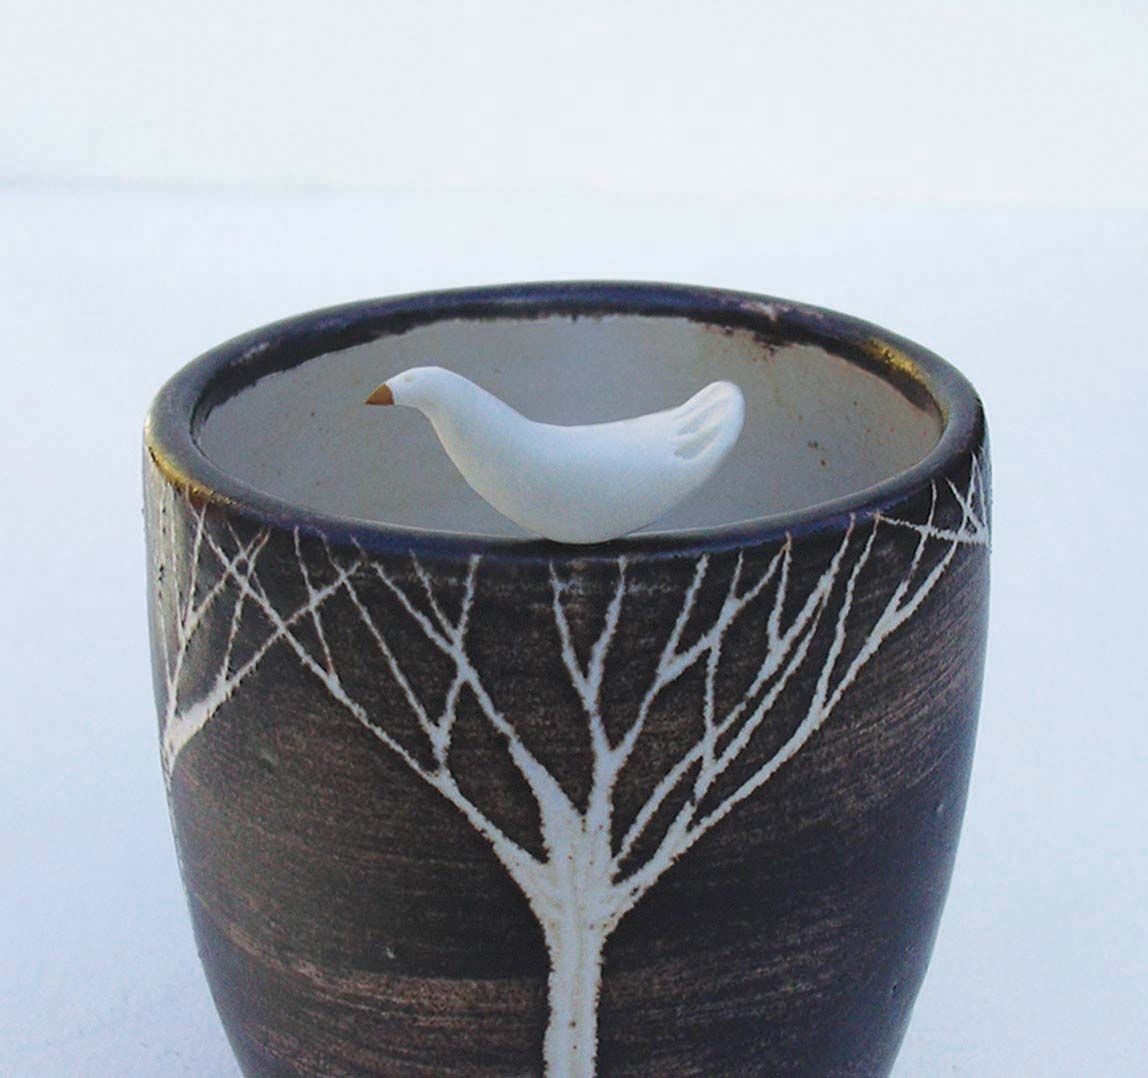 Love, love, love this bird vessel by Jane Bygrave.